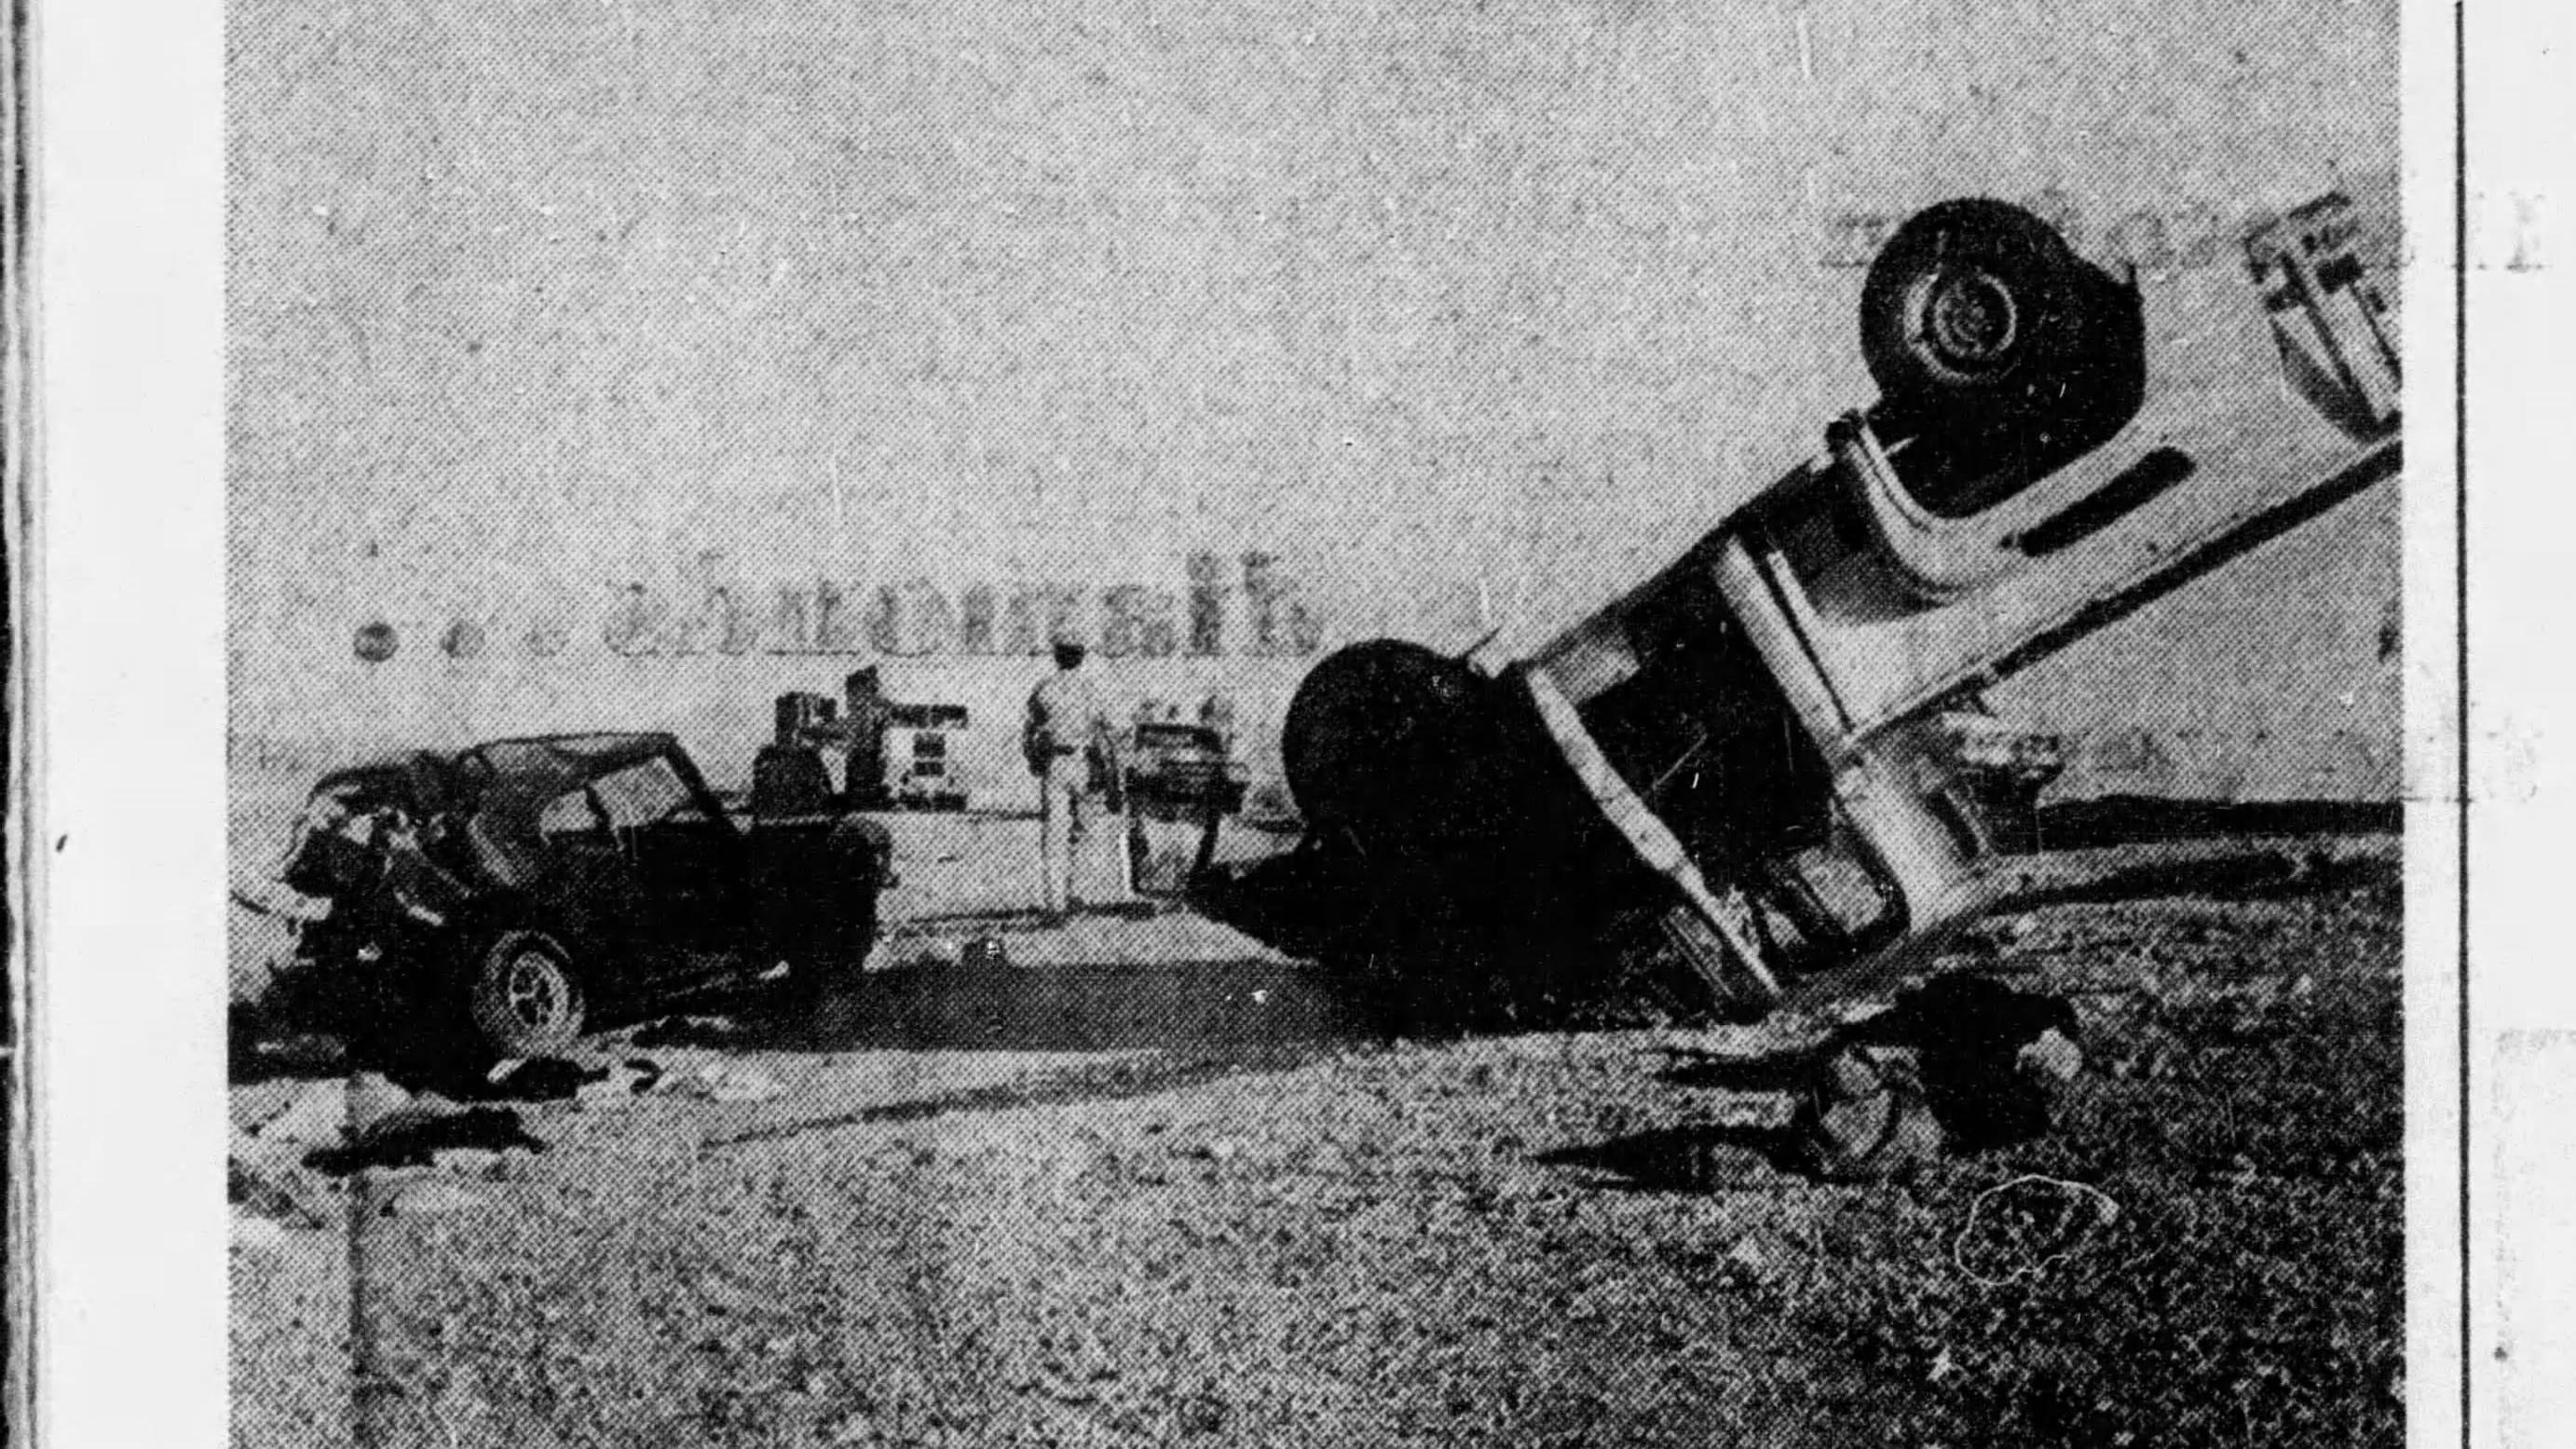 Don Bolles files: The drunken crash that led to tougher Arizona DUI laws